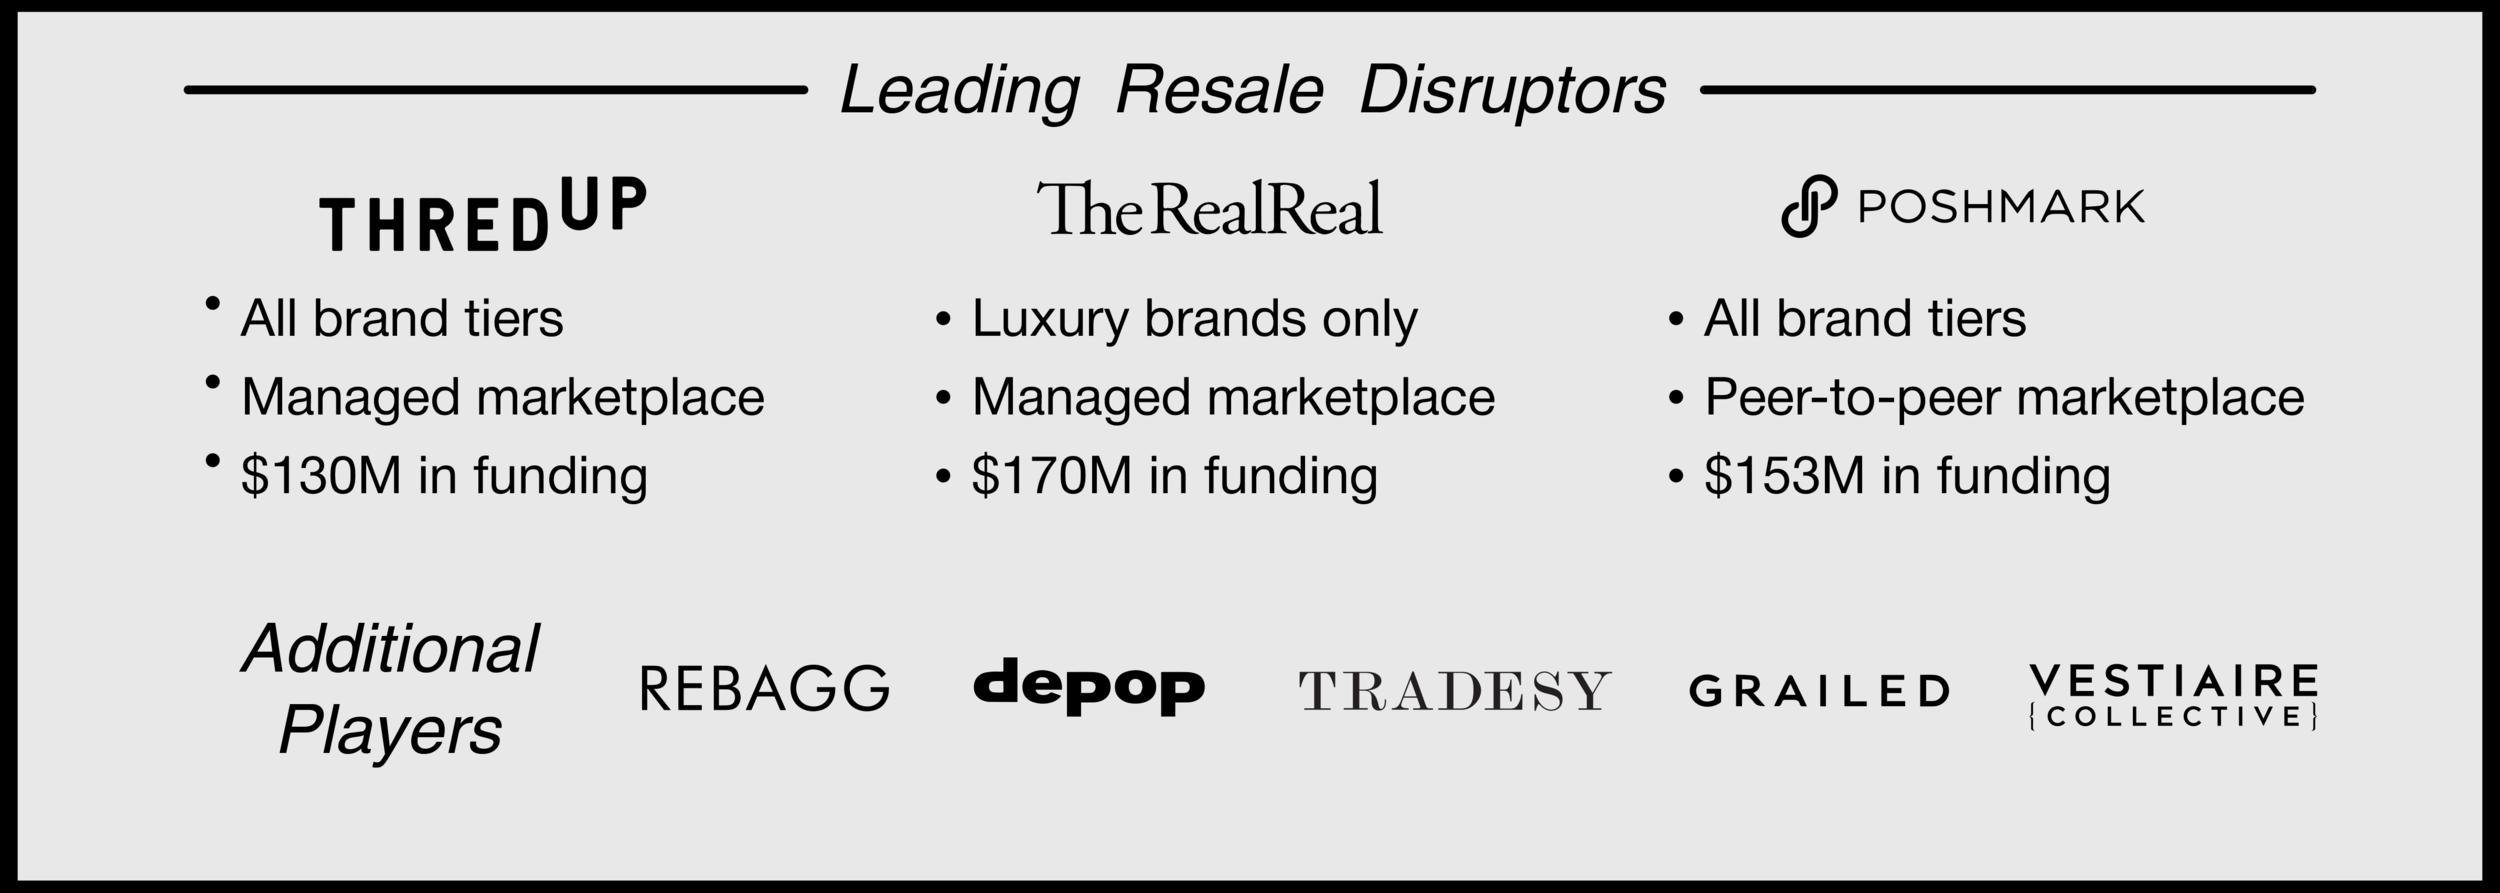 Leading resale disruptors